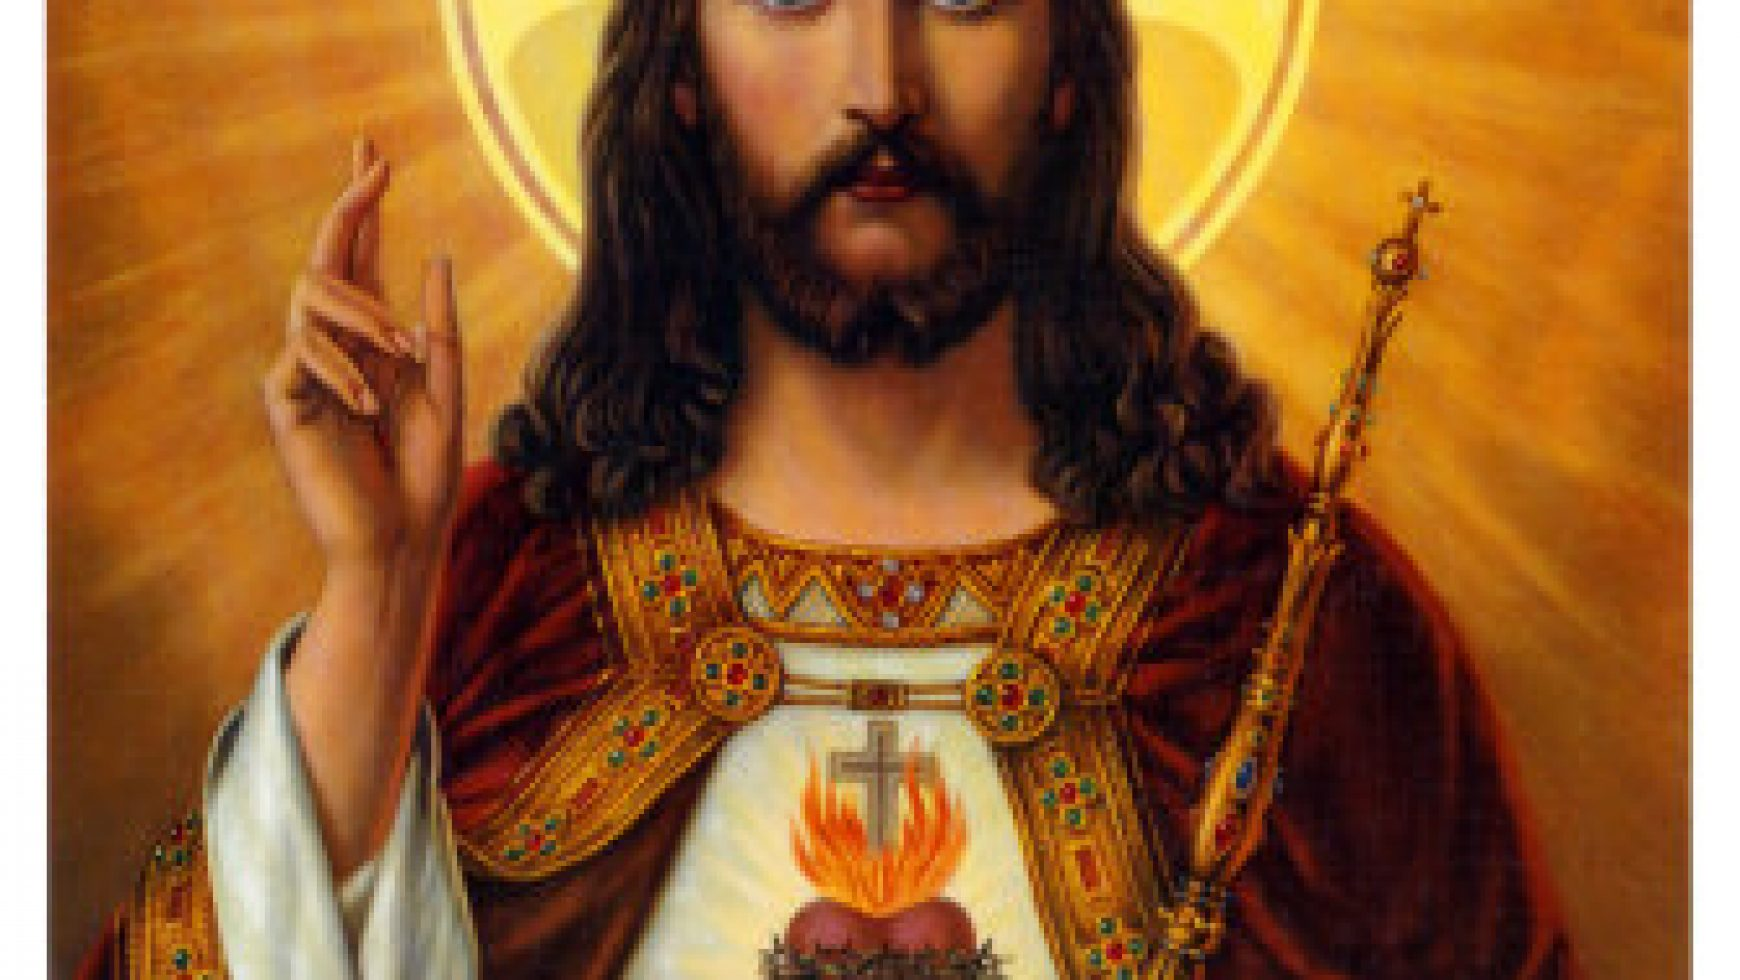 Jesus, Lord of Armies